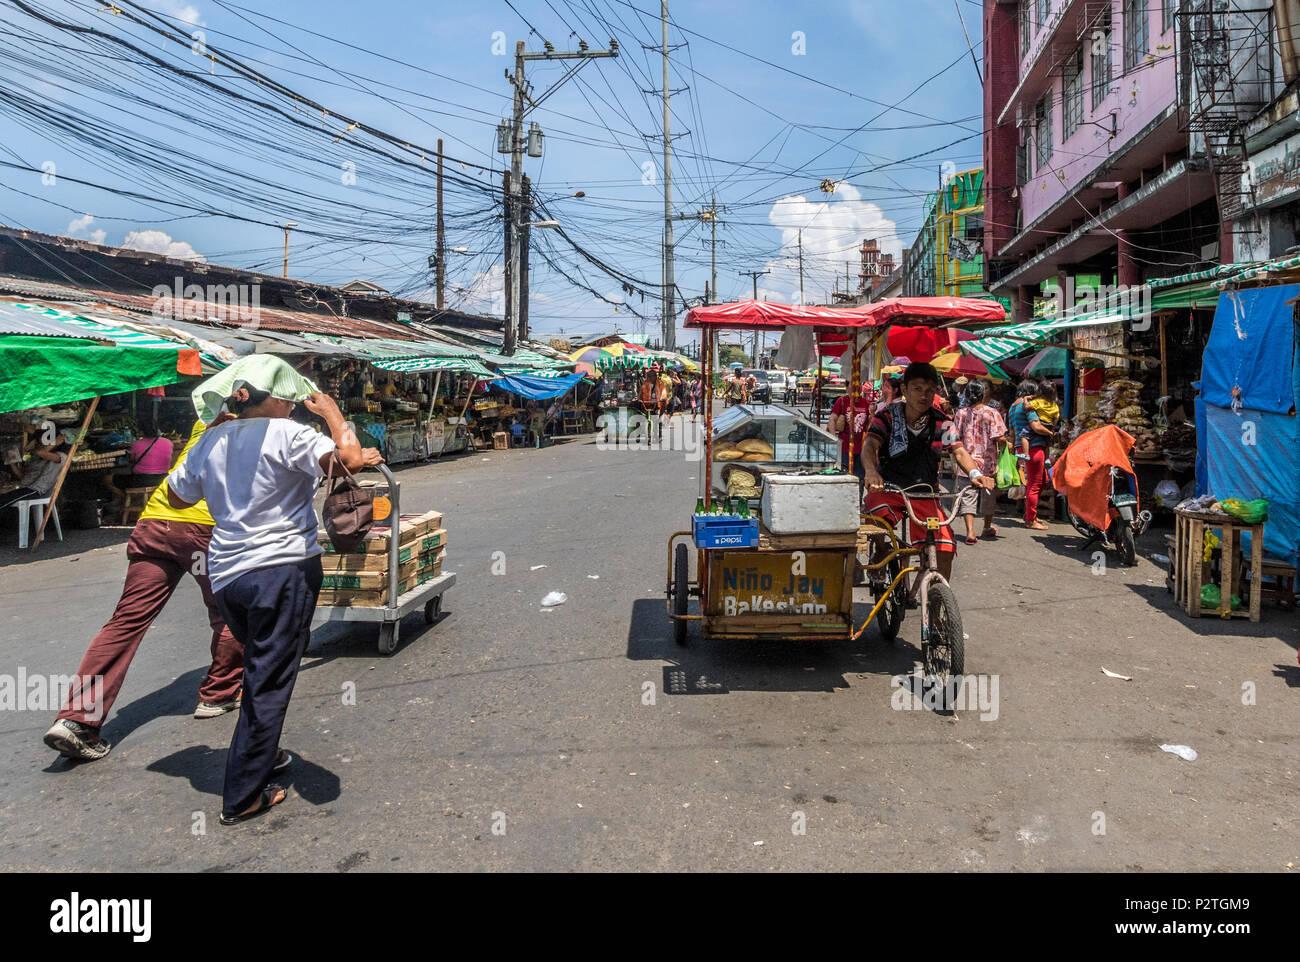 luoghi di incontri economici a Cebu